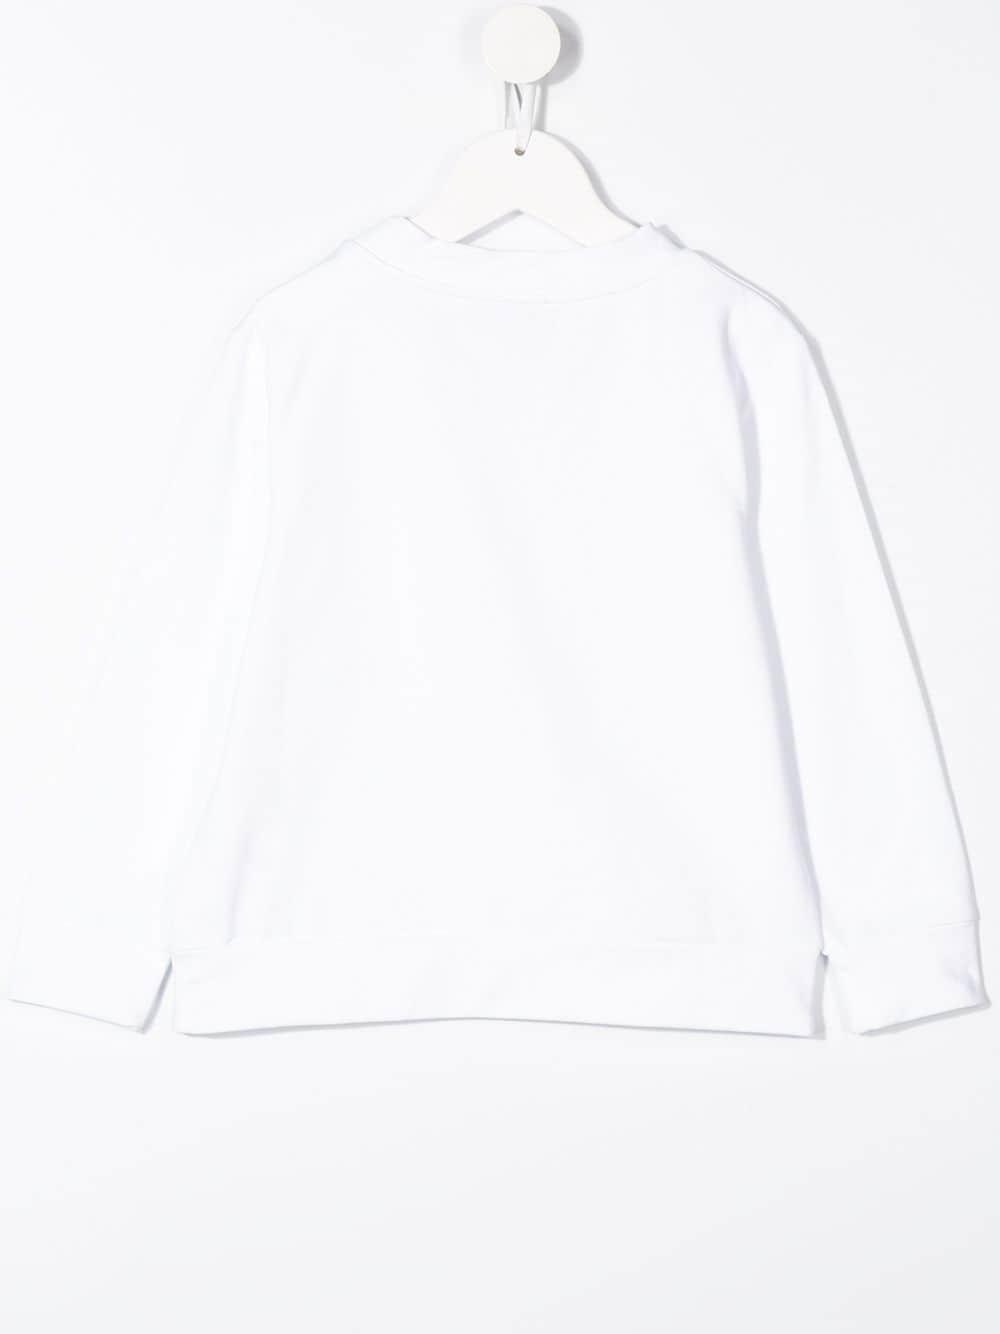 EMILIO PUCCI | Sweatshirt | 9M4000MX180100